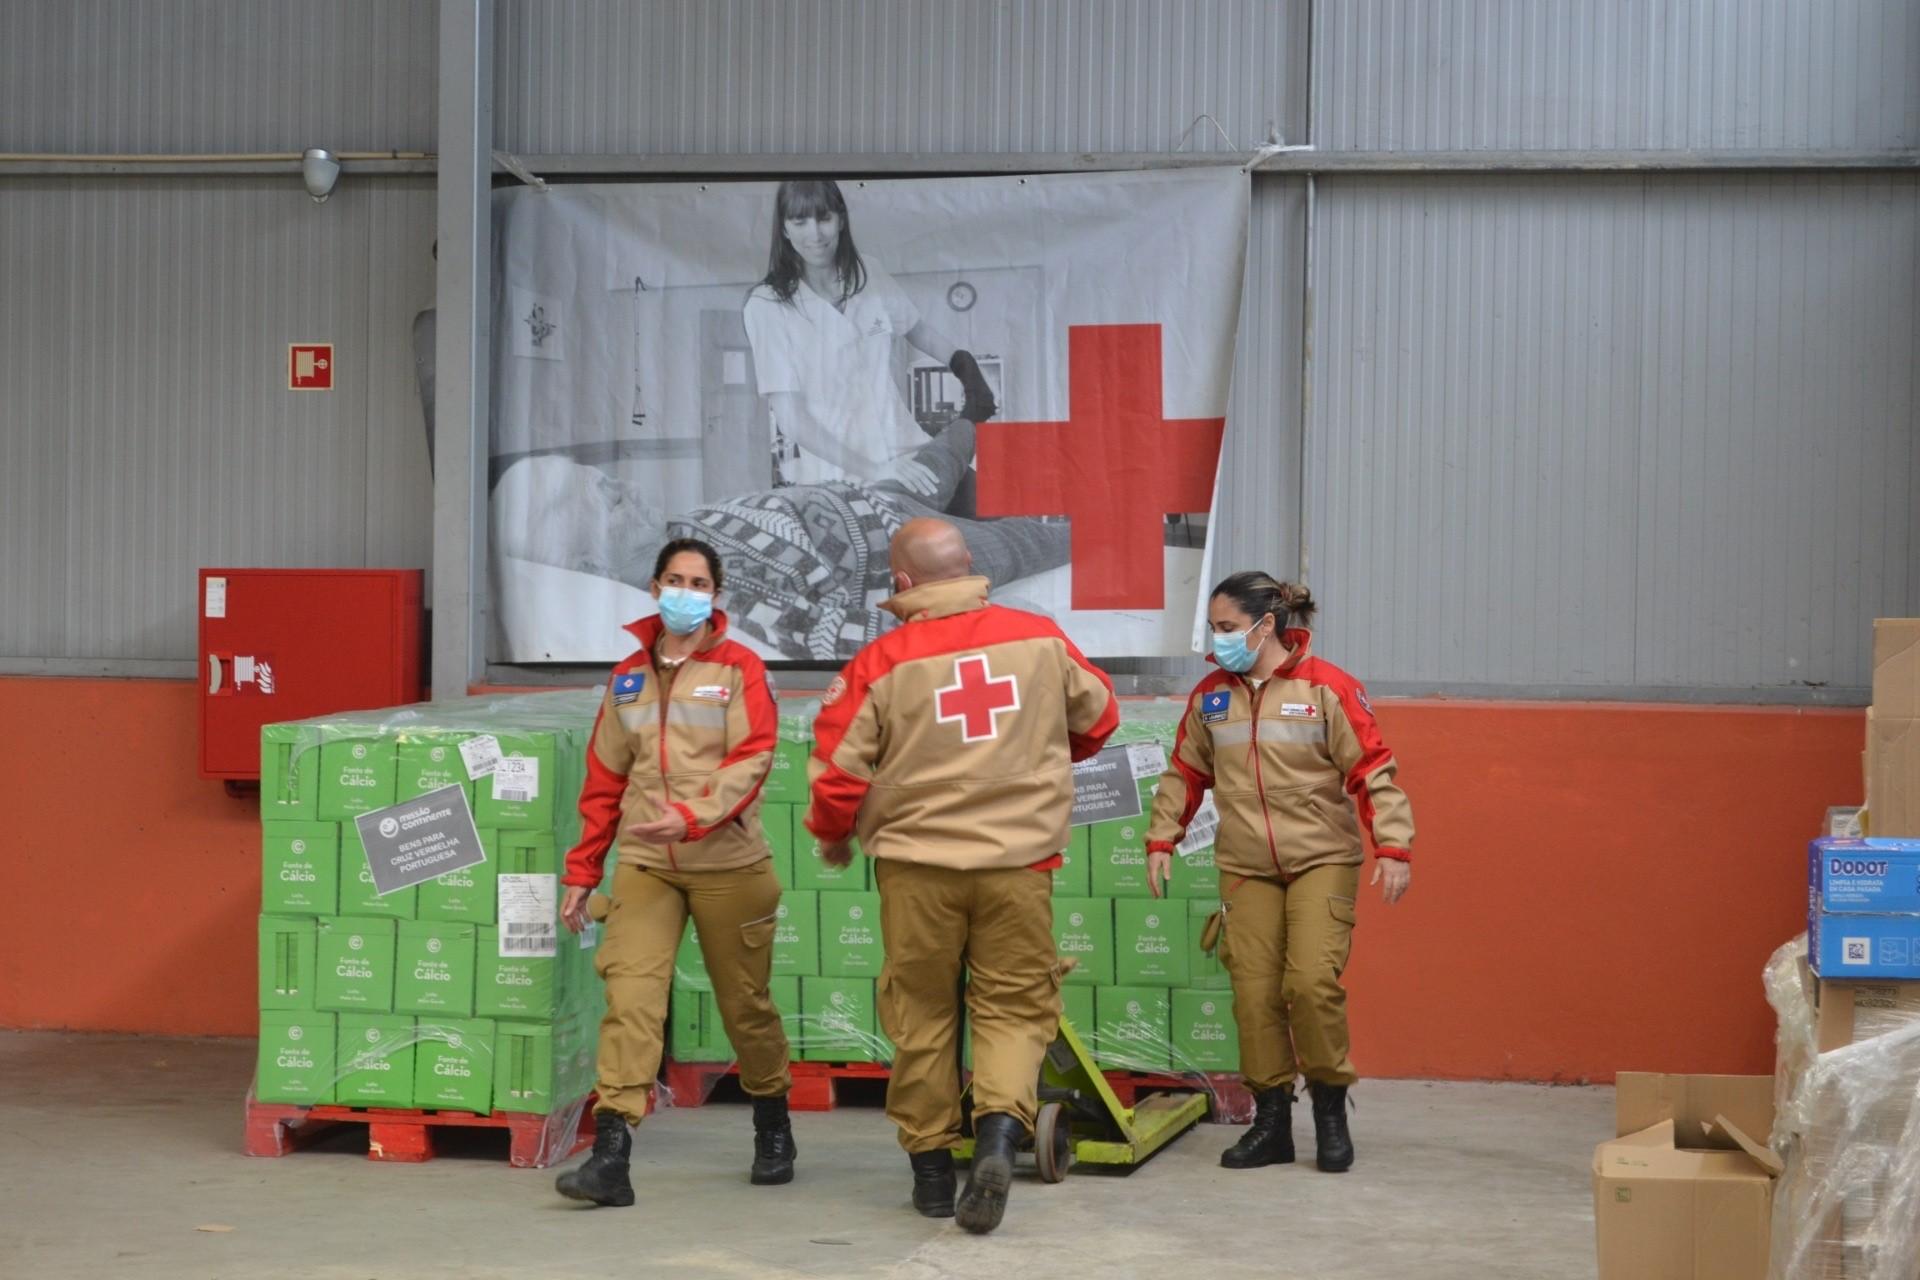 Portuguese Red Cross